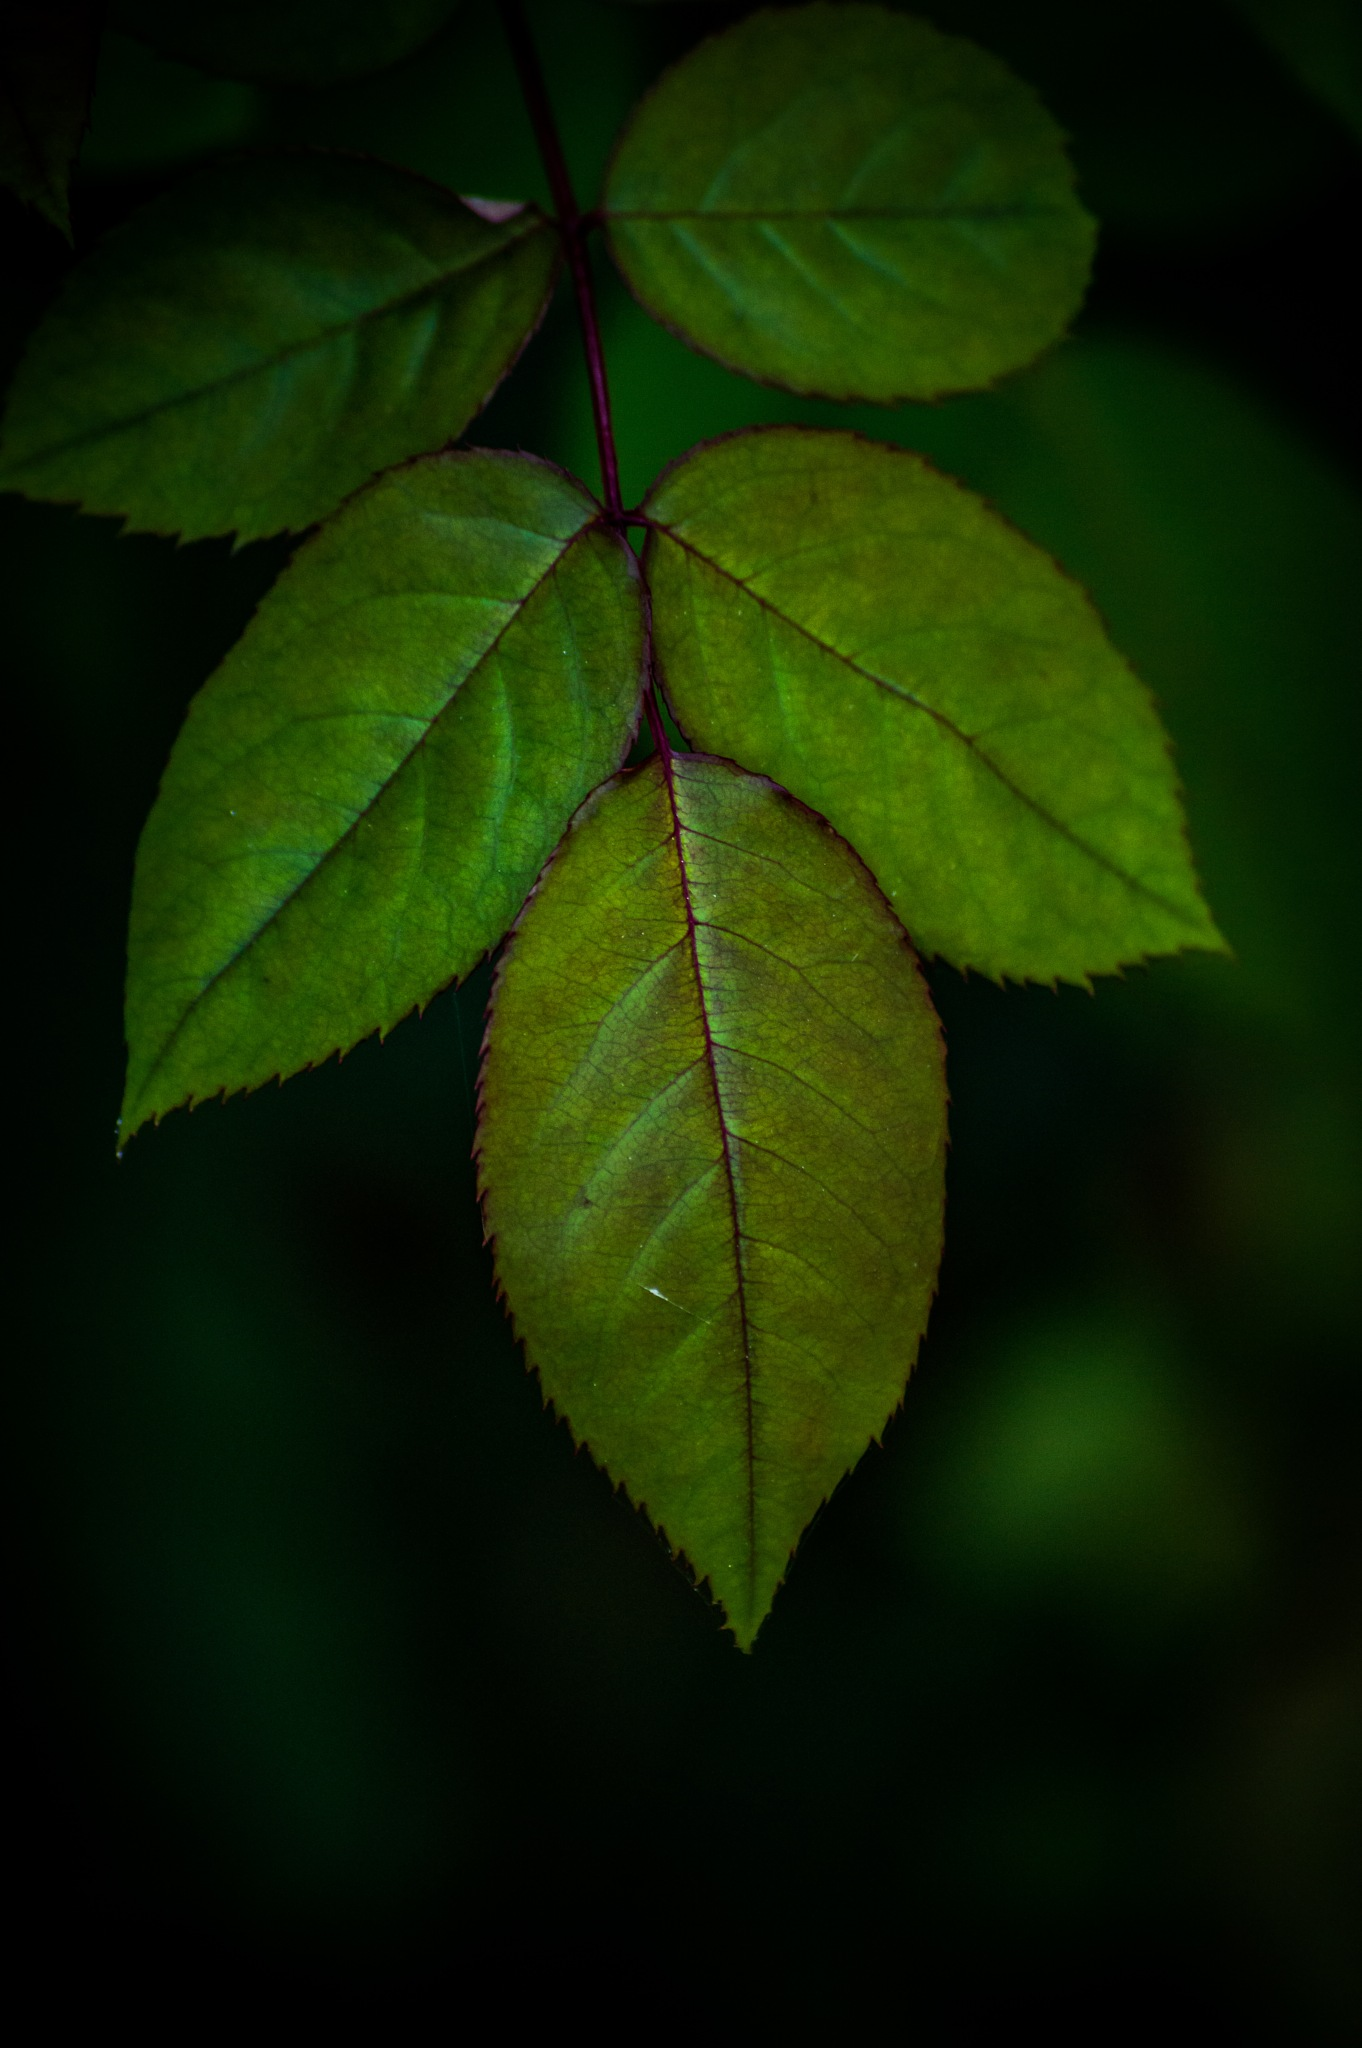 Green leafs by Iulian Bud